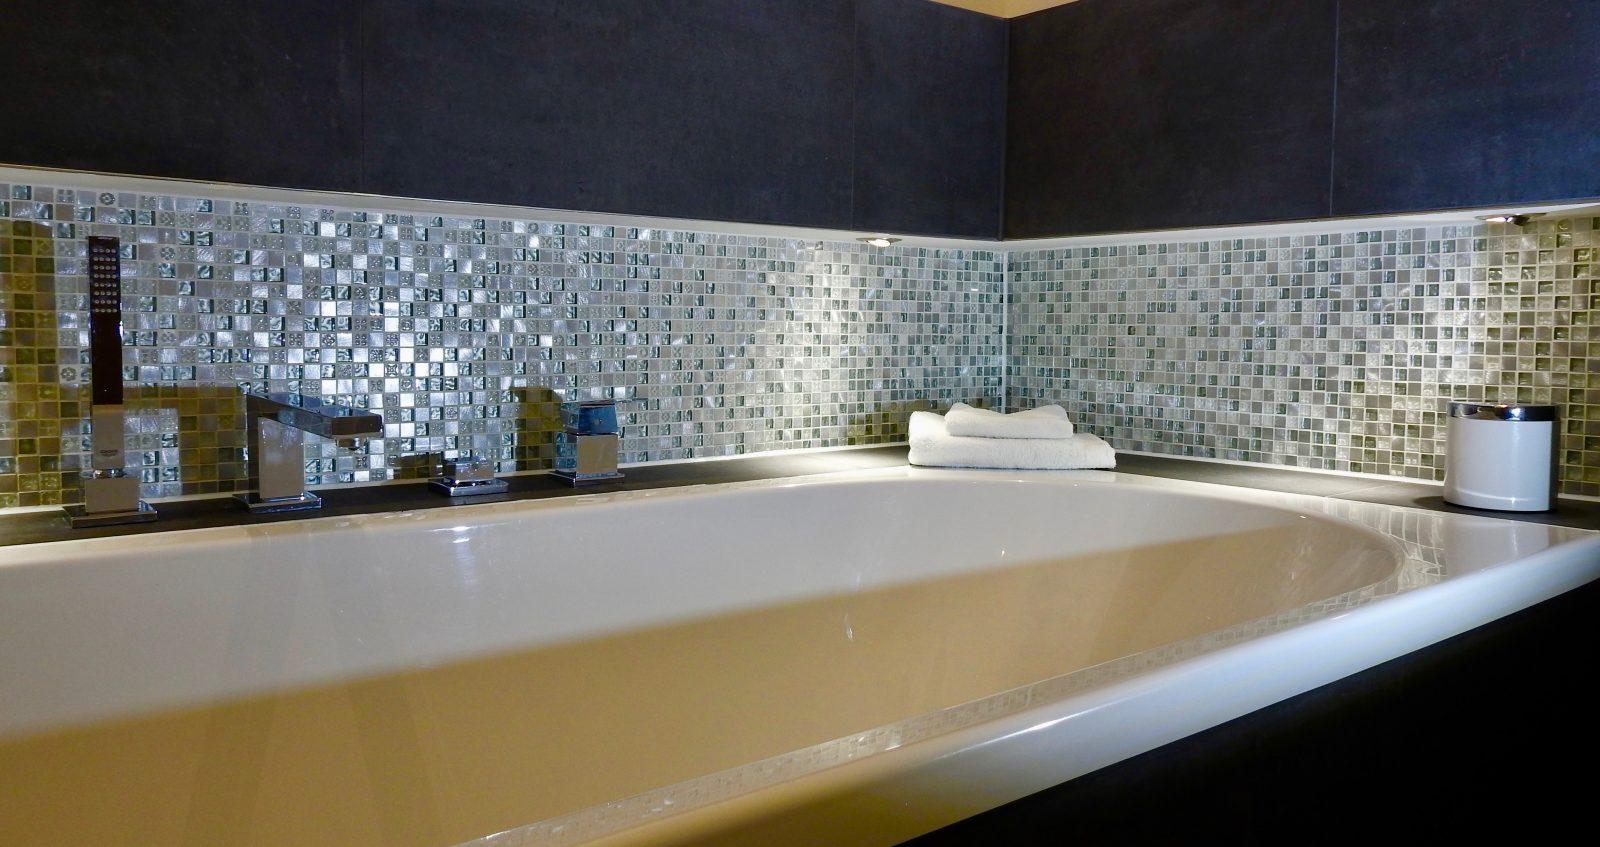 Inspirationen neumann gmbh m nchen haustechnik for Inspiration badgestaltung